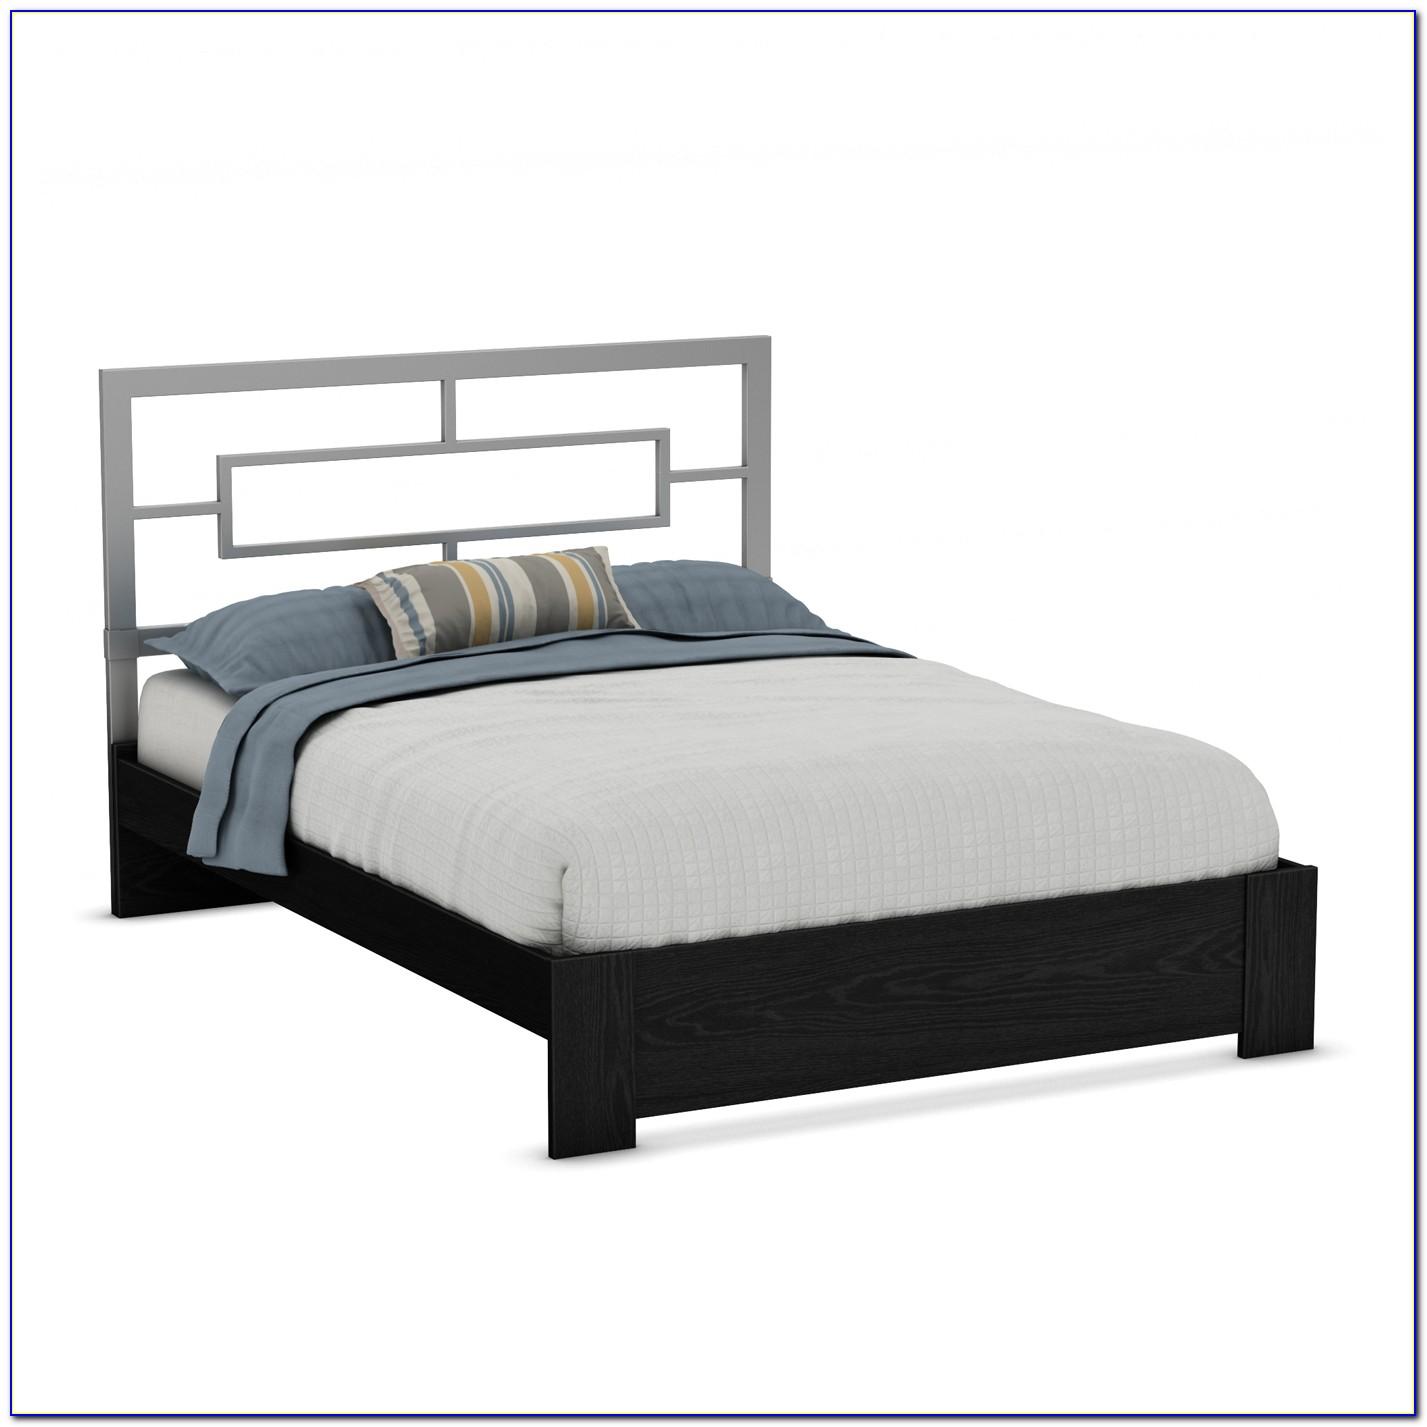 Headboards For Full Size Platform Beds